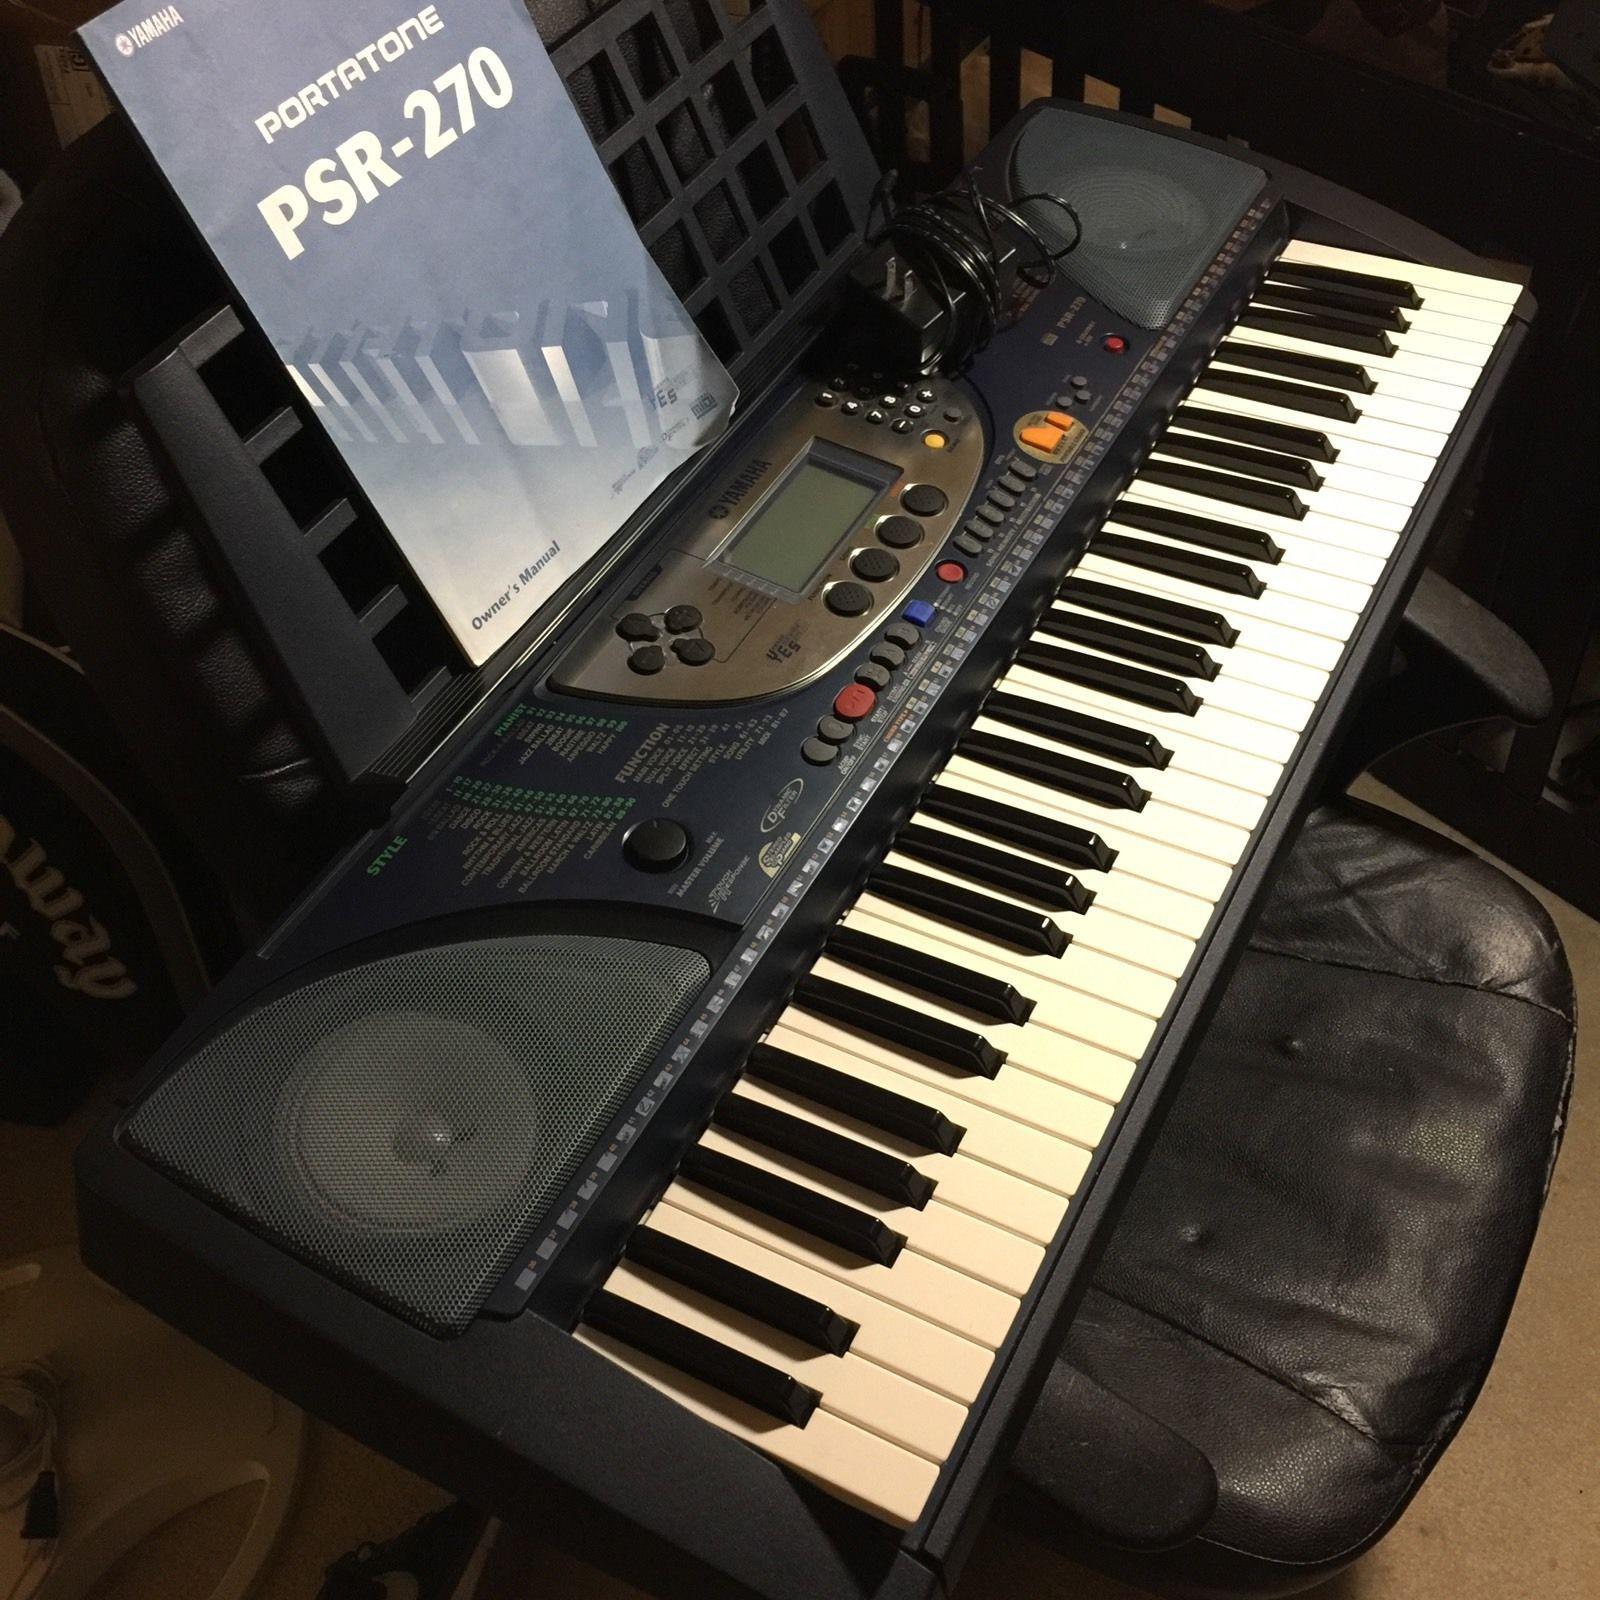 yamaha psr 270 portatone electronic navy blue keyboard synthesizer w rh pinterest com yamaha psr 270 service manual yamaha psr 270 manual español